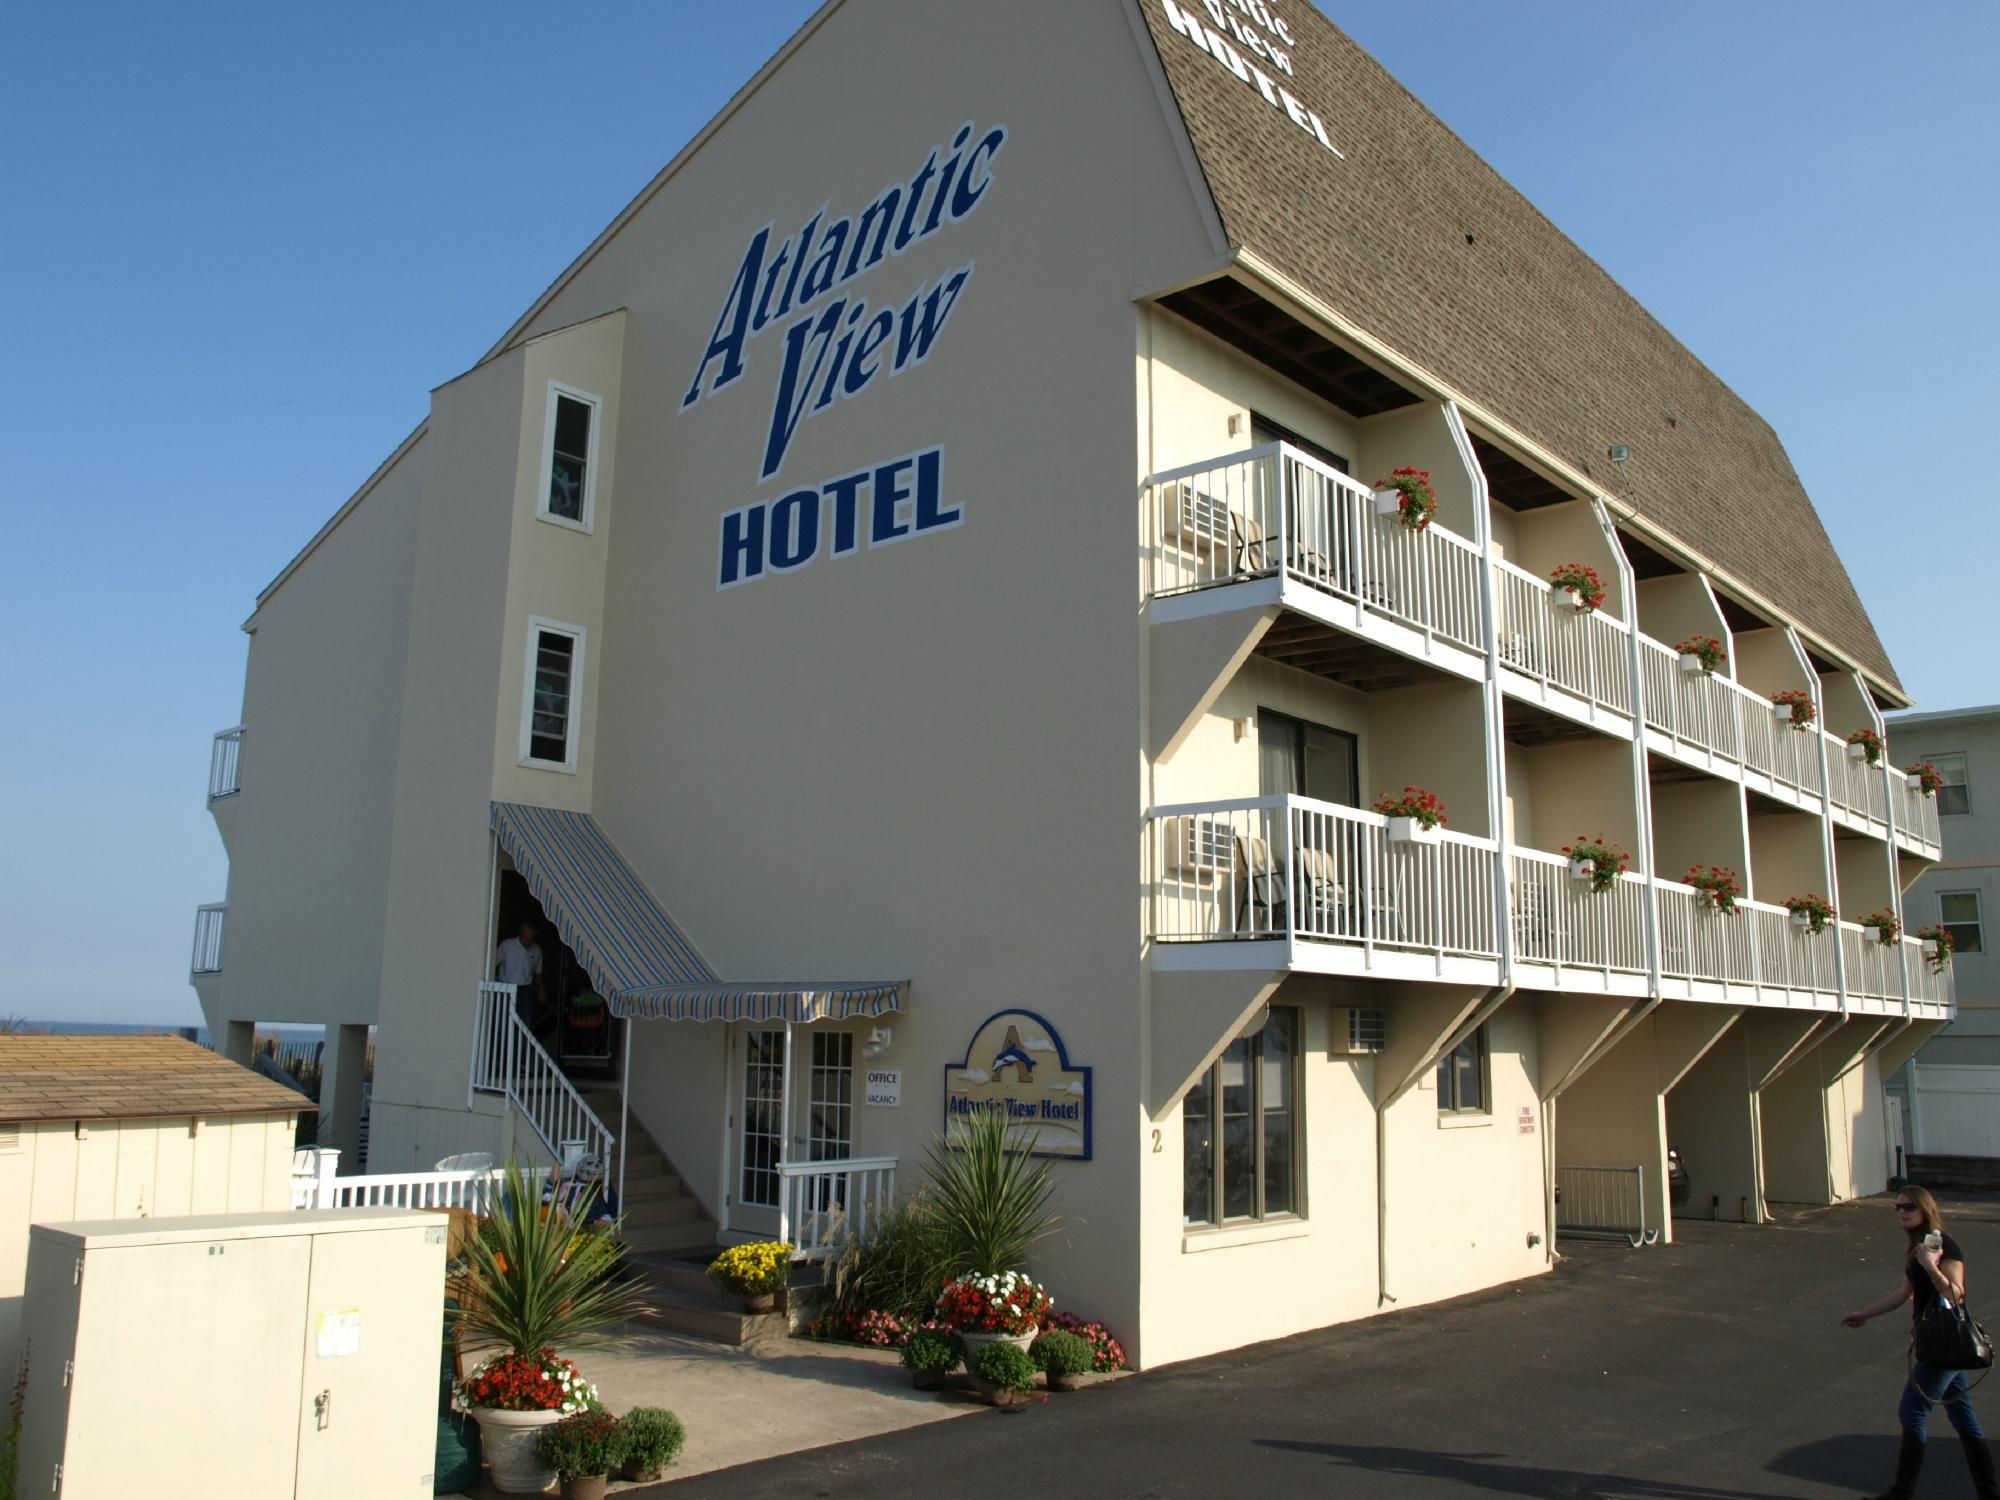 Atlantic View Hotel Dewey Beach De 2018 Review Family